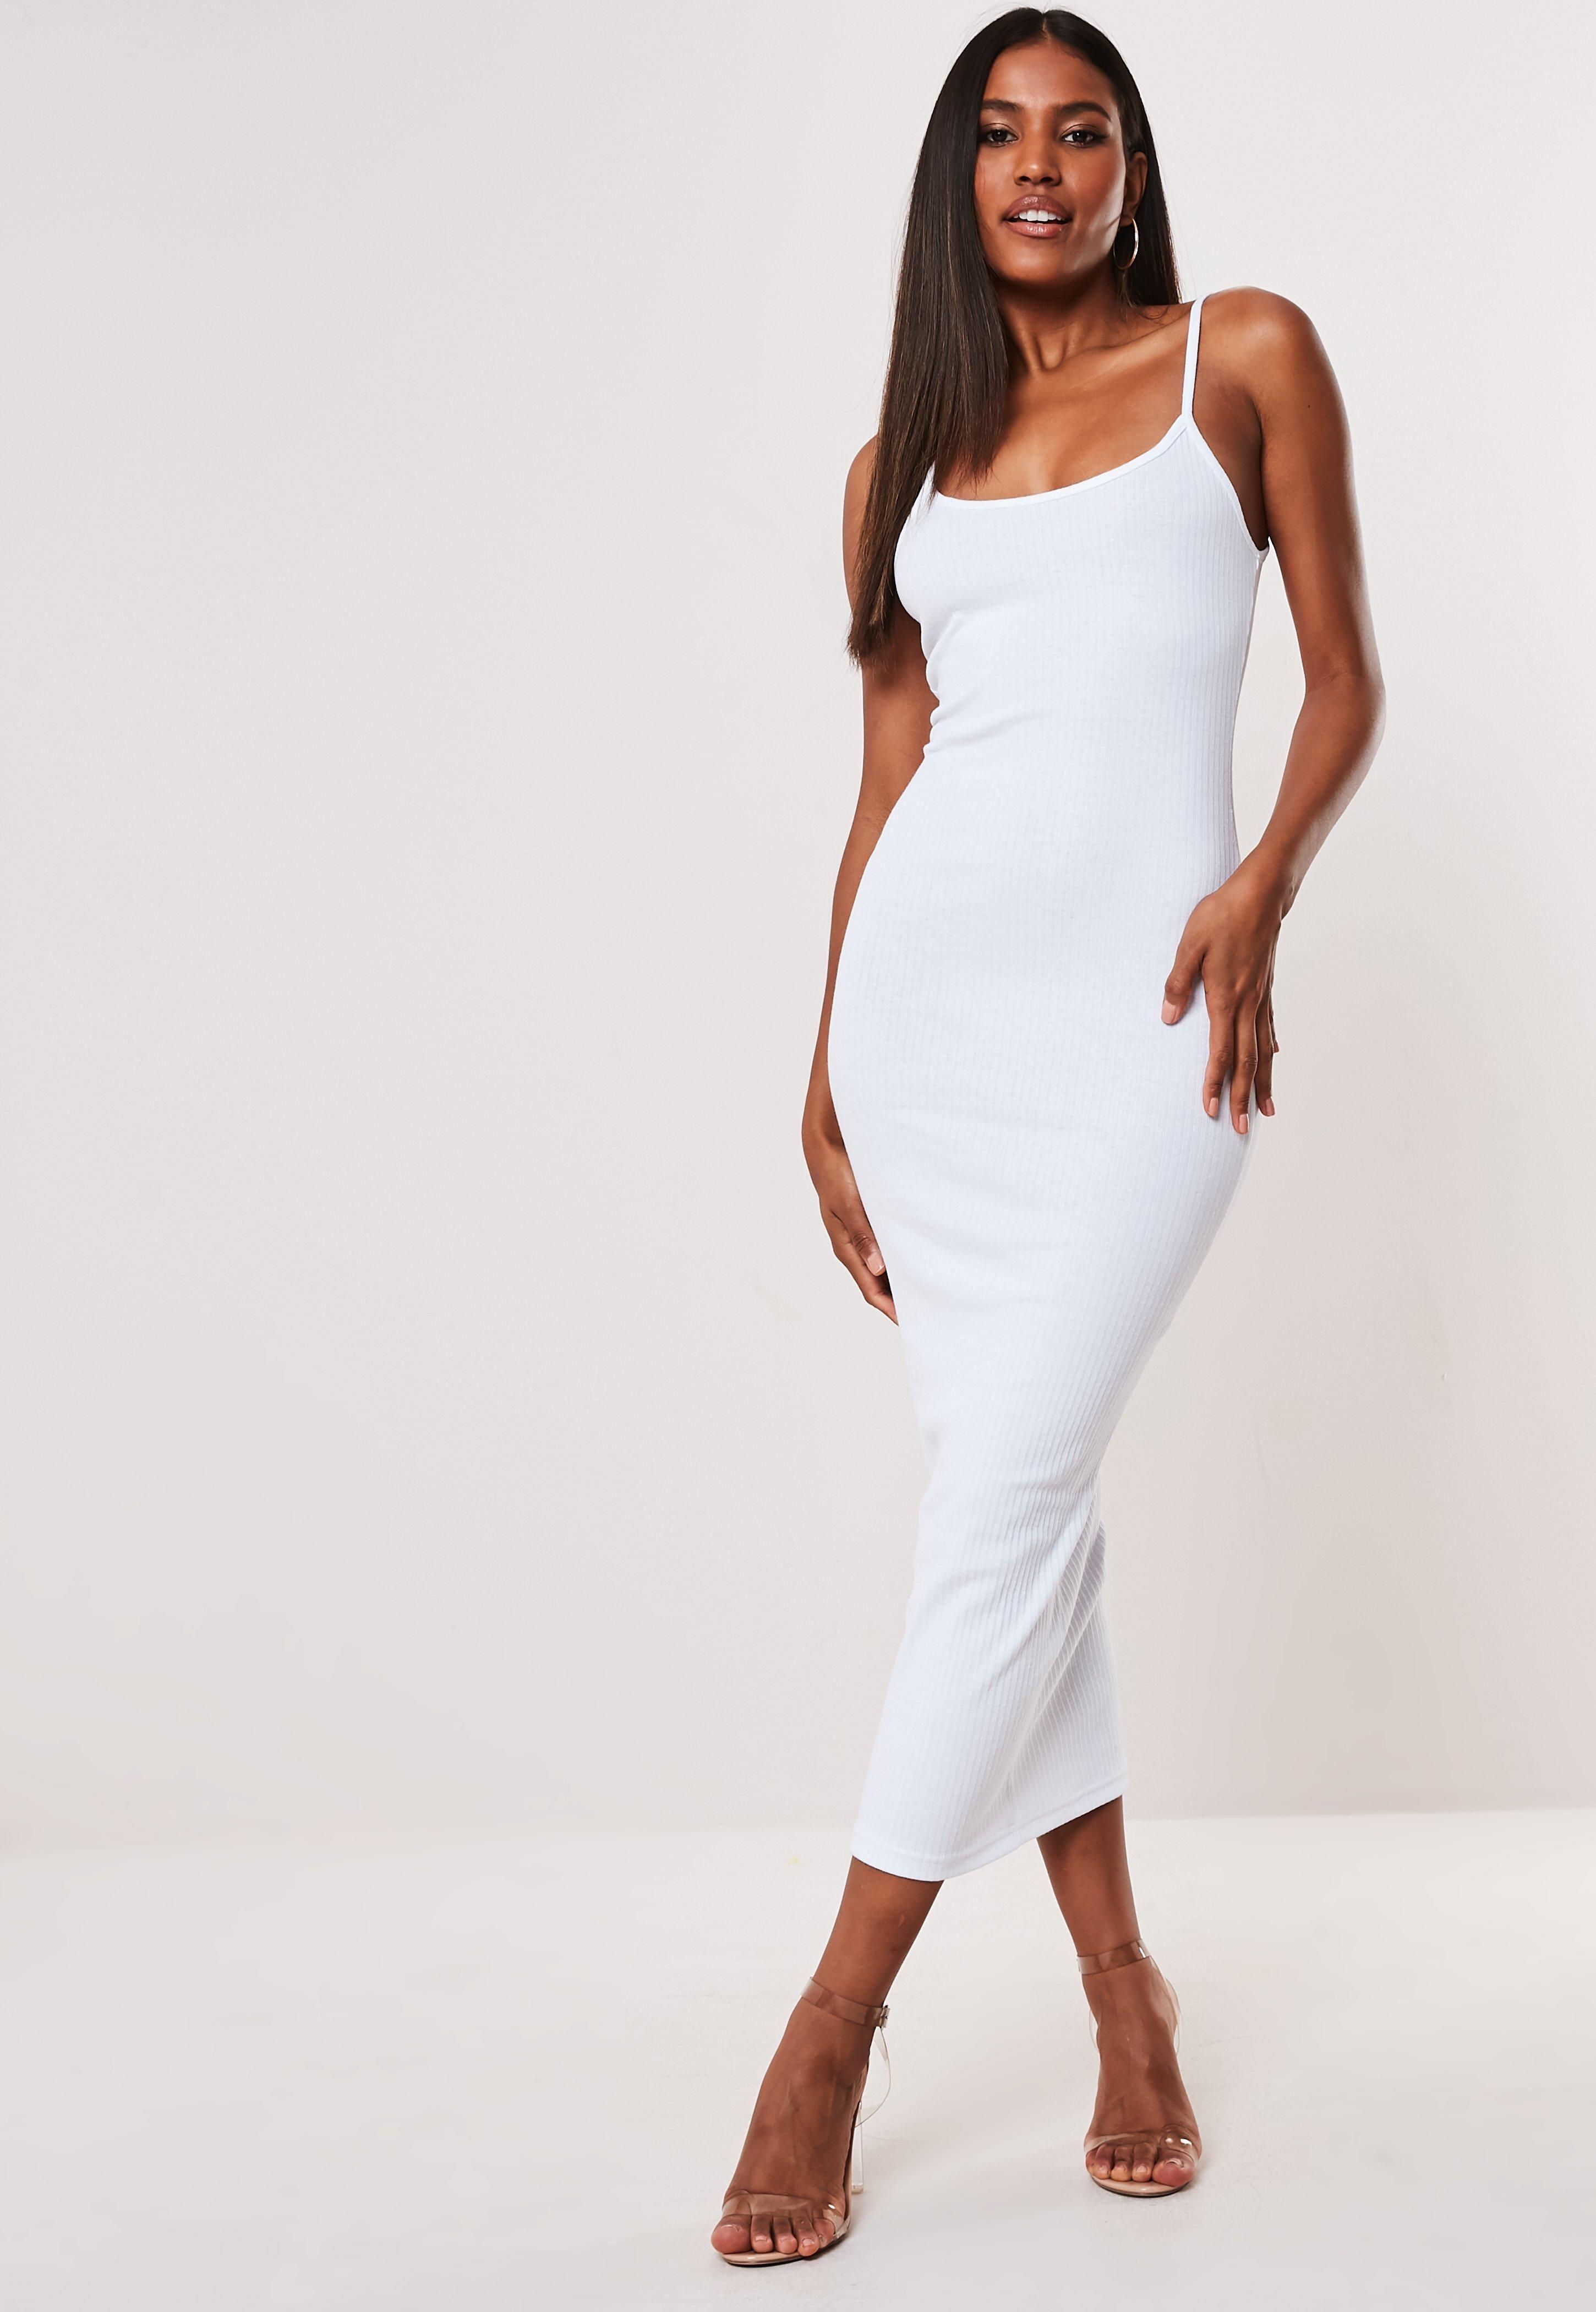 White Ribbed Strappy Bodycon Midi Dress Sponsored Strappy Aff Ribbed White Midi Dress Outfit Midi Dress Bodycon Trending Dresses [ 4200 x 2900 Pixel ]